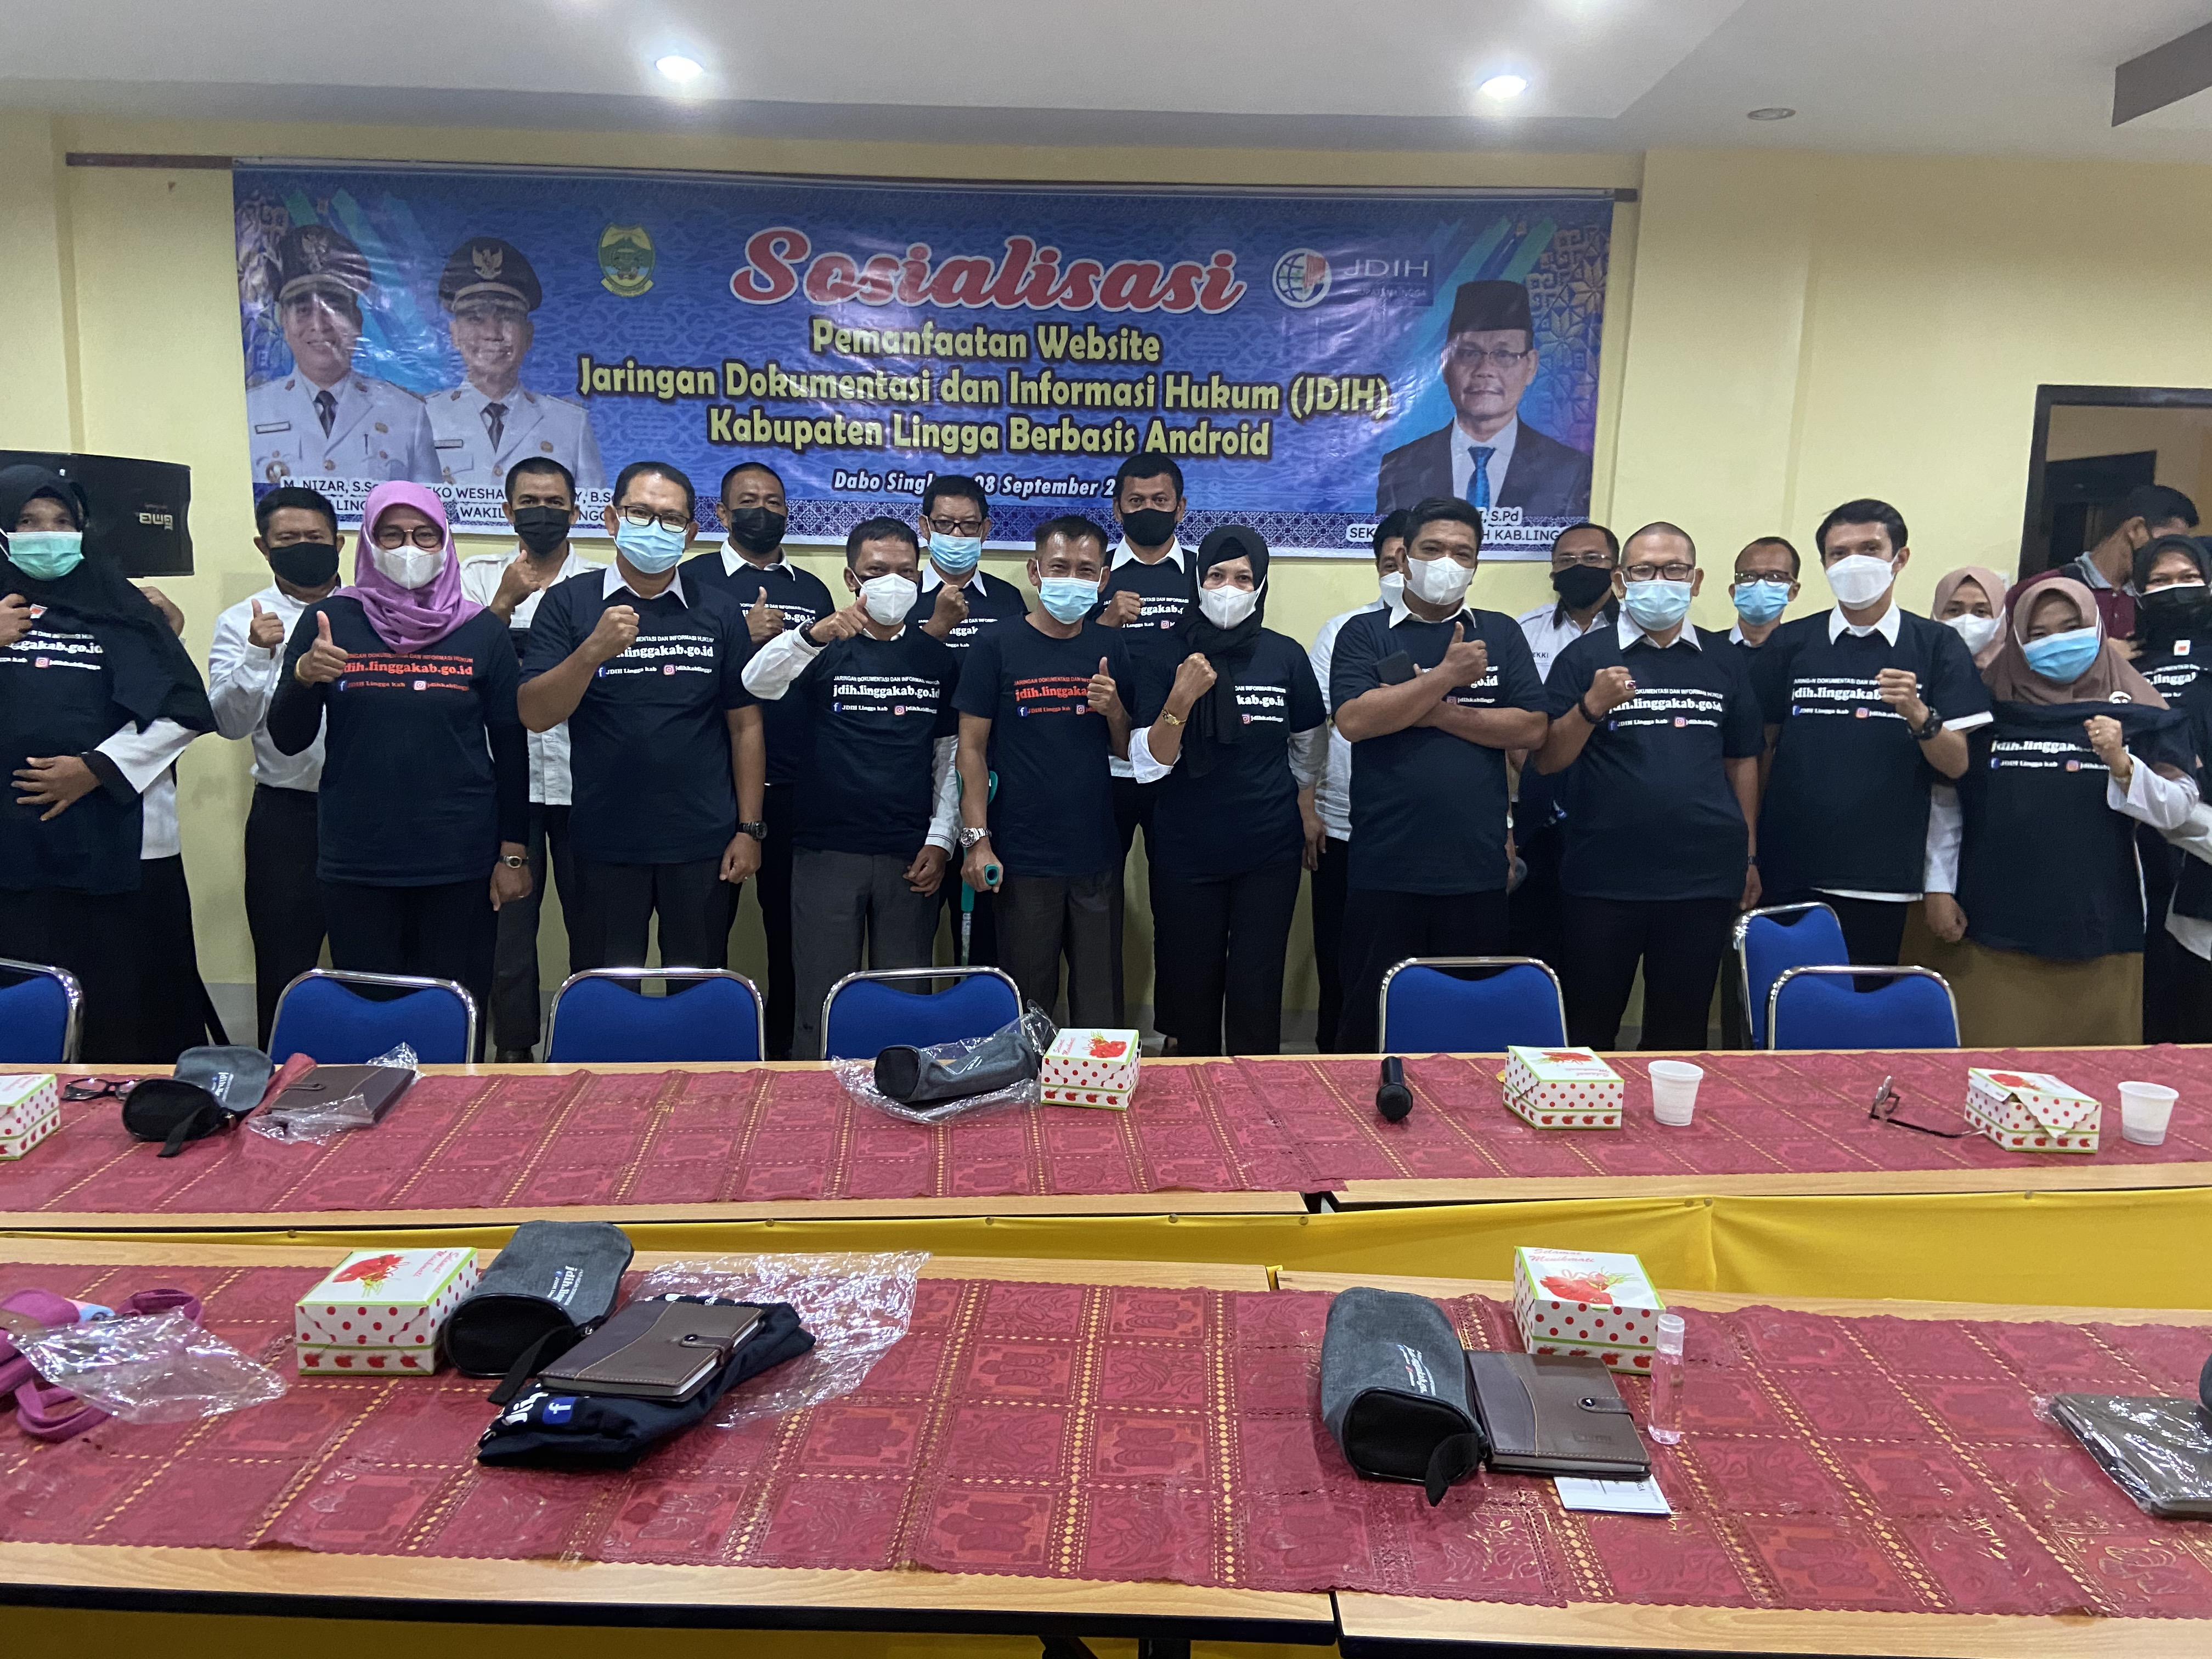 Sosialisasi Pemanfaatan Website JDIH Kabupaten Lin